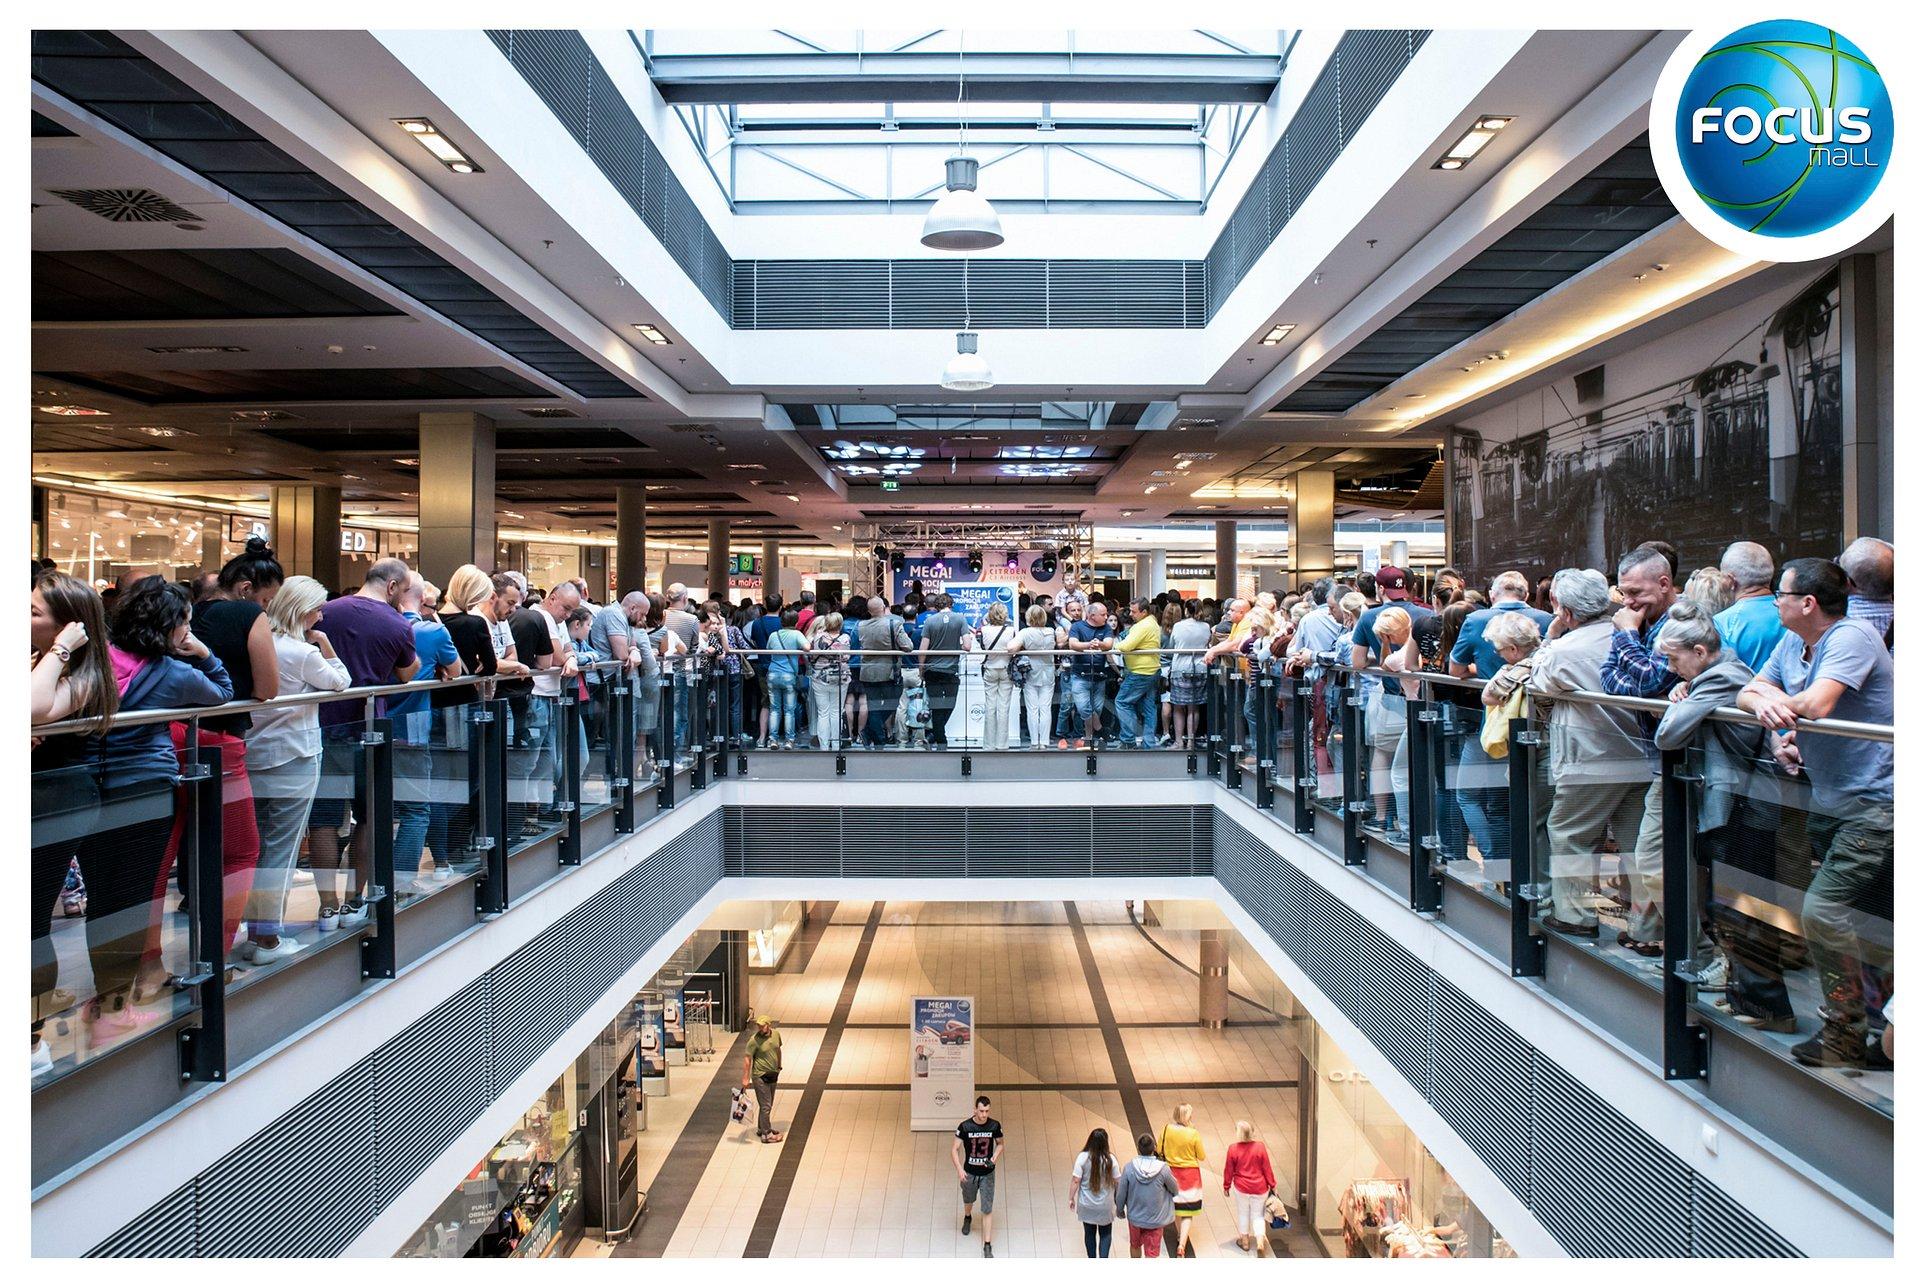 Focus Mall Zielona Góra: za nami kolejny udany rok